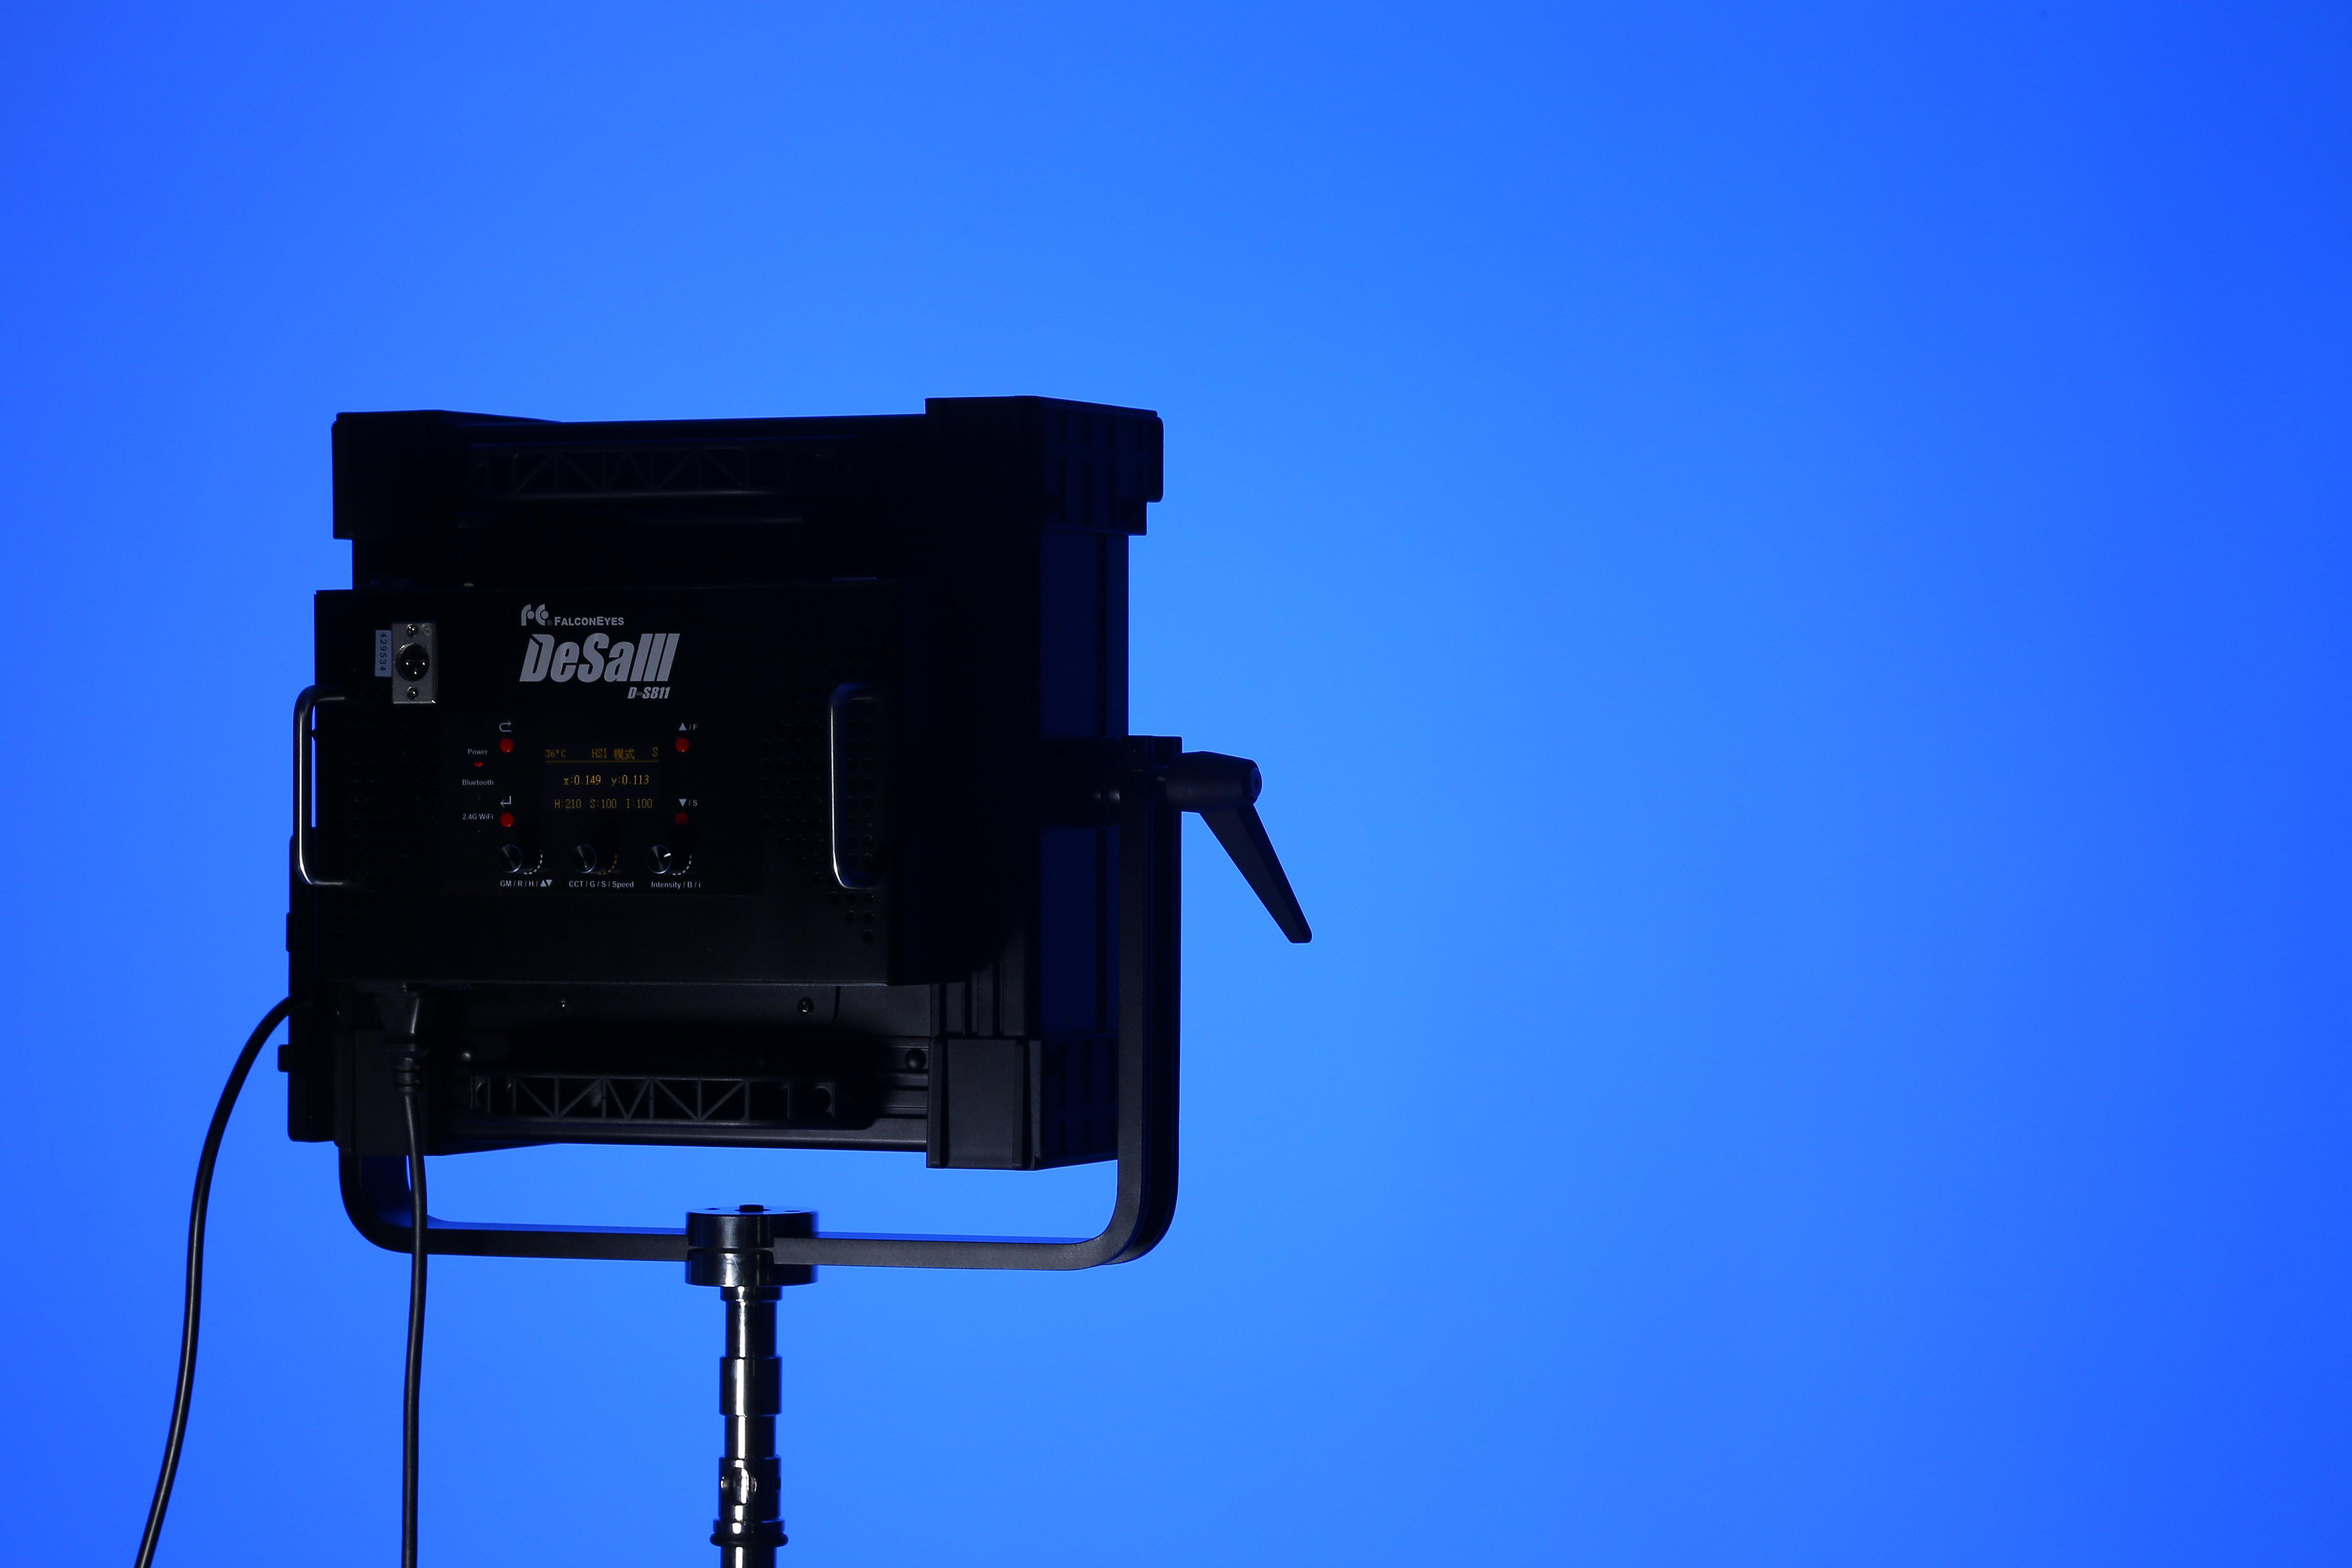 Falcon Eyes DESAL DS-811 RGB 200W Color Temperature 2800K-10000K Soft LED Light Support DMX-512 HSI Bluetooth APP Remote Control